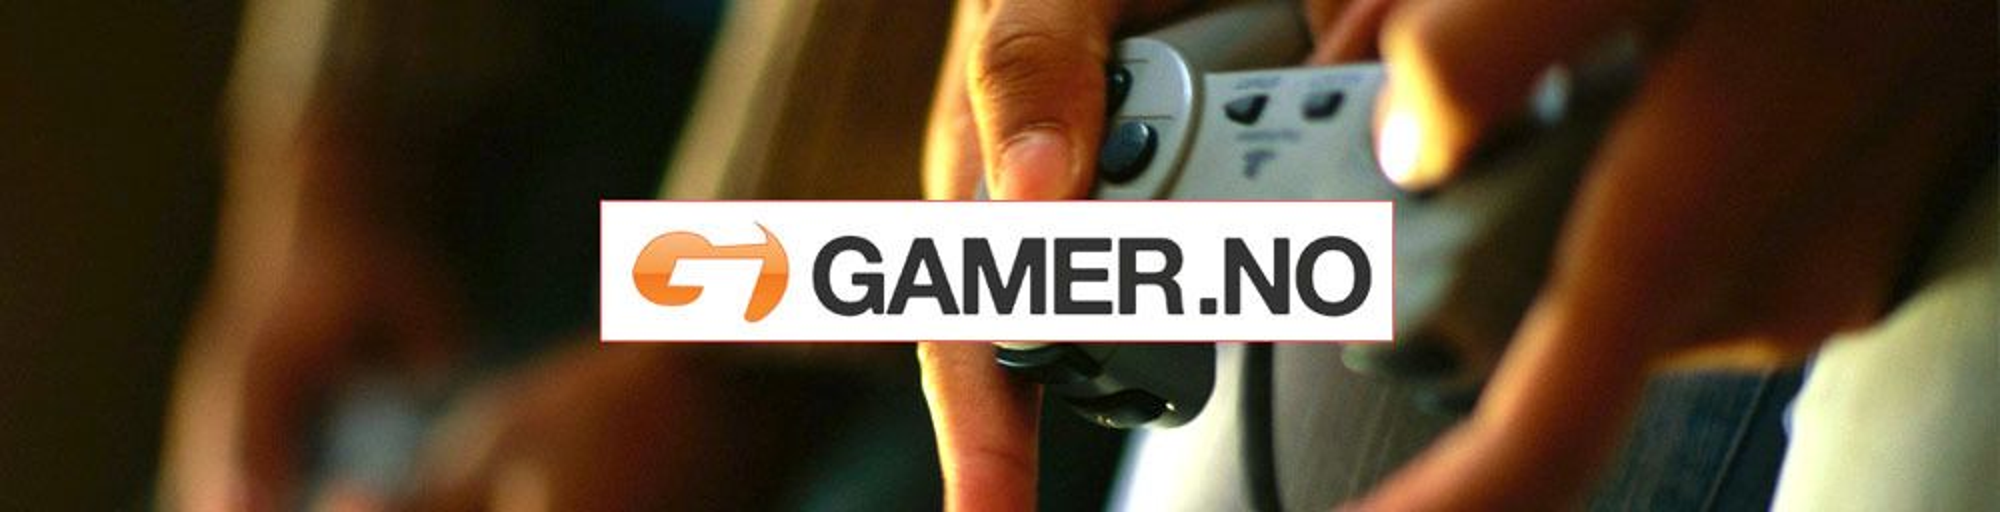 Gamer.no